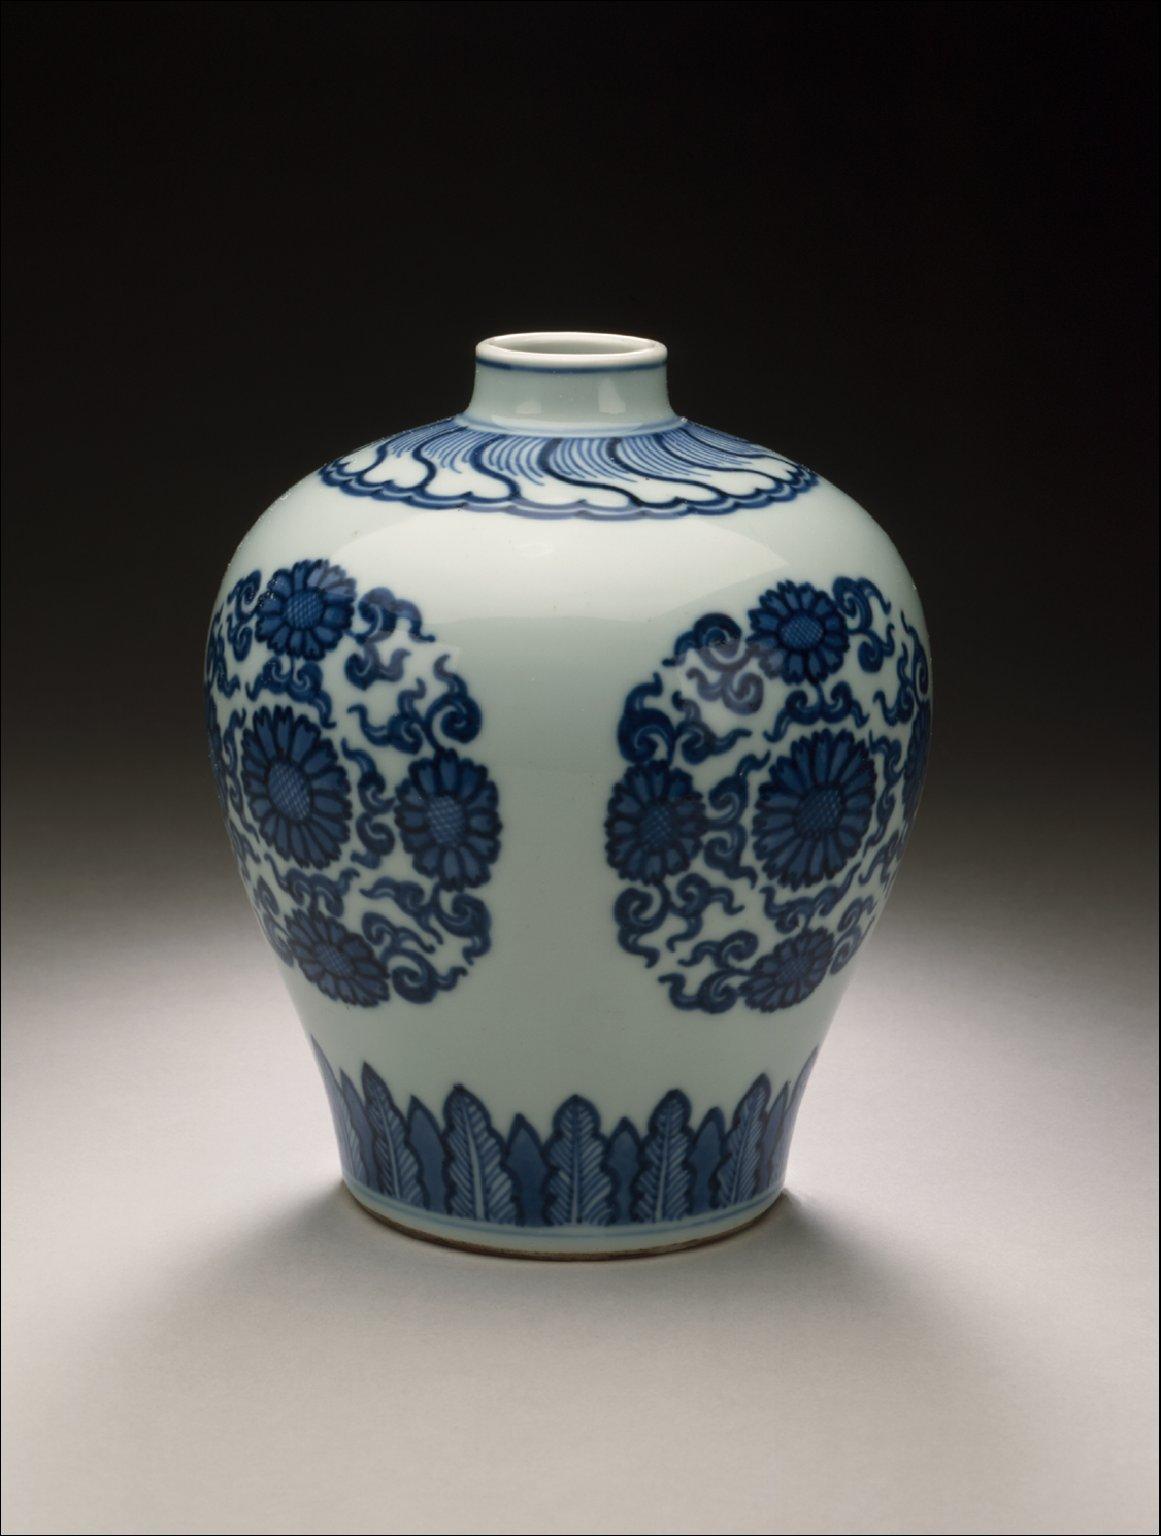 Jar (Ping) with Chrysanthemum Medallions